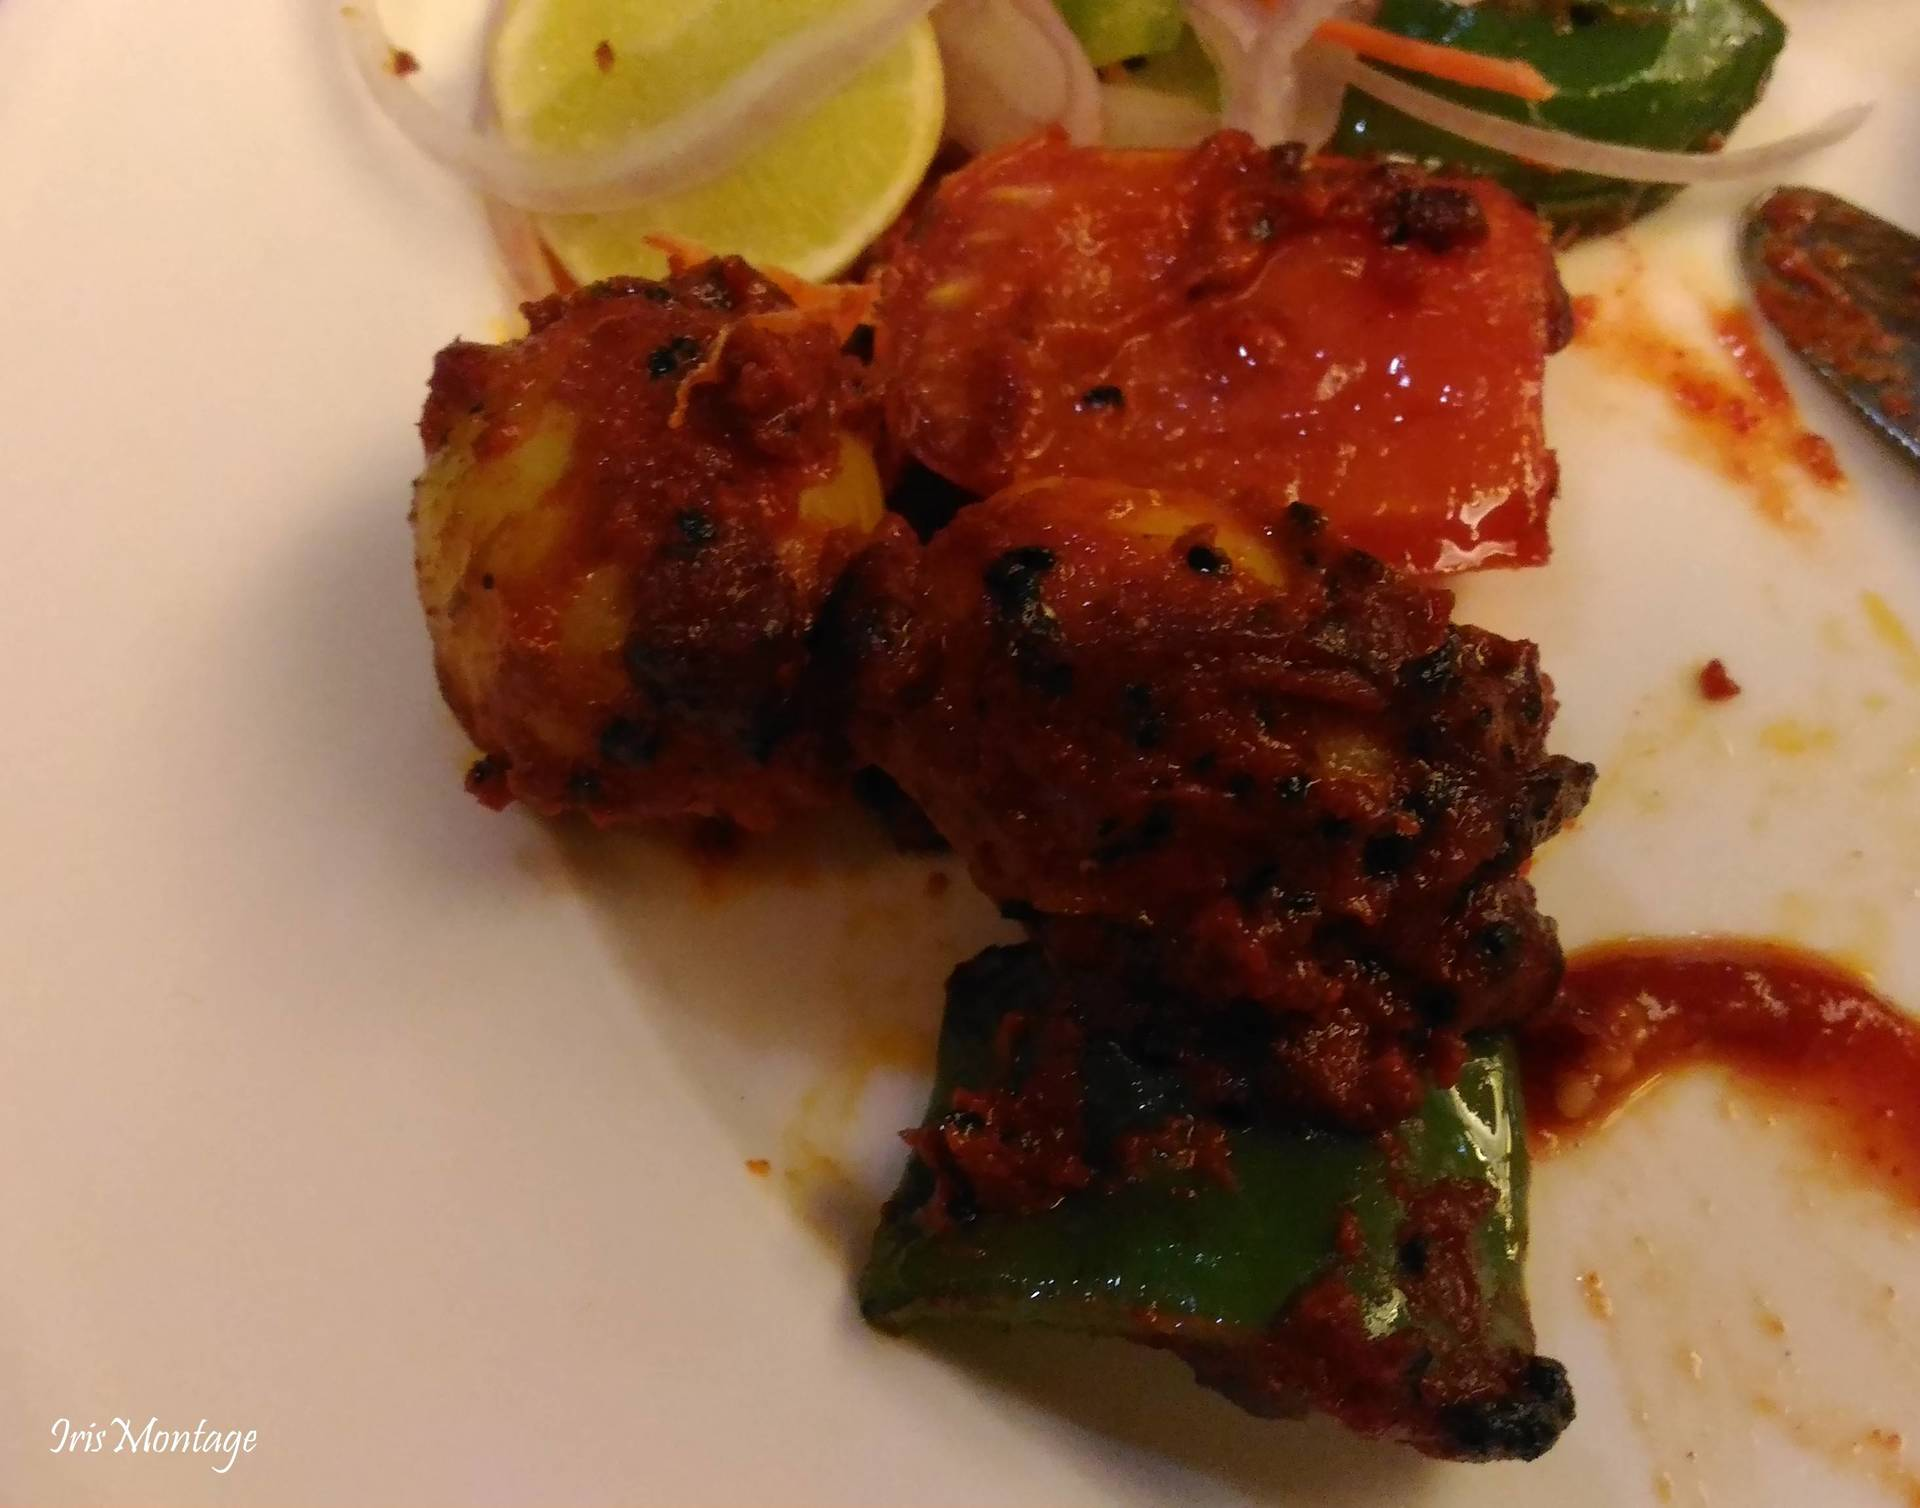 Nikhil's blog - 5